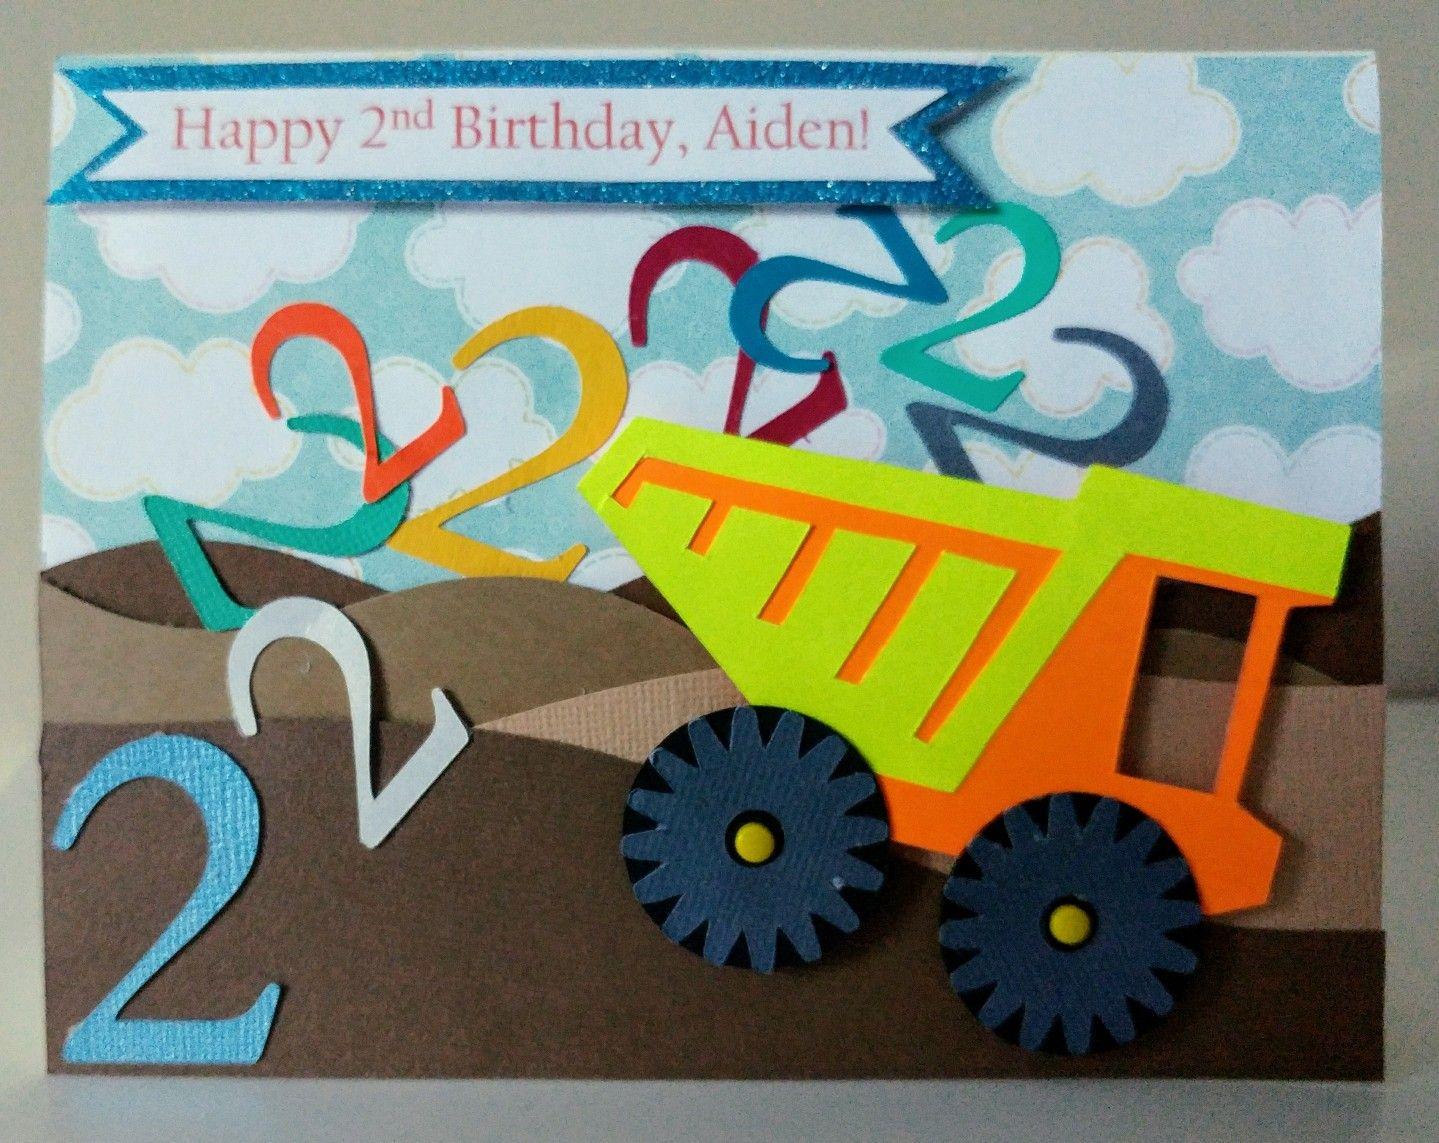 2nd Birthday Card Dump Truck Theme Deborahsmithcreation Kids Birthday Cards Kids Cards Happy 2nd Birthday